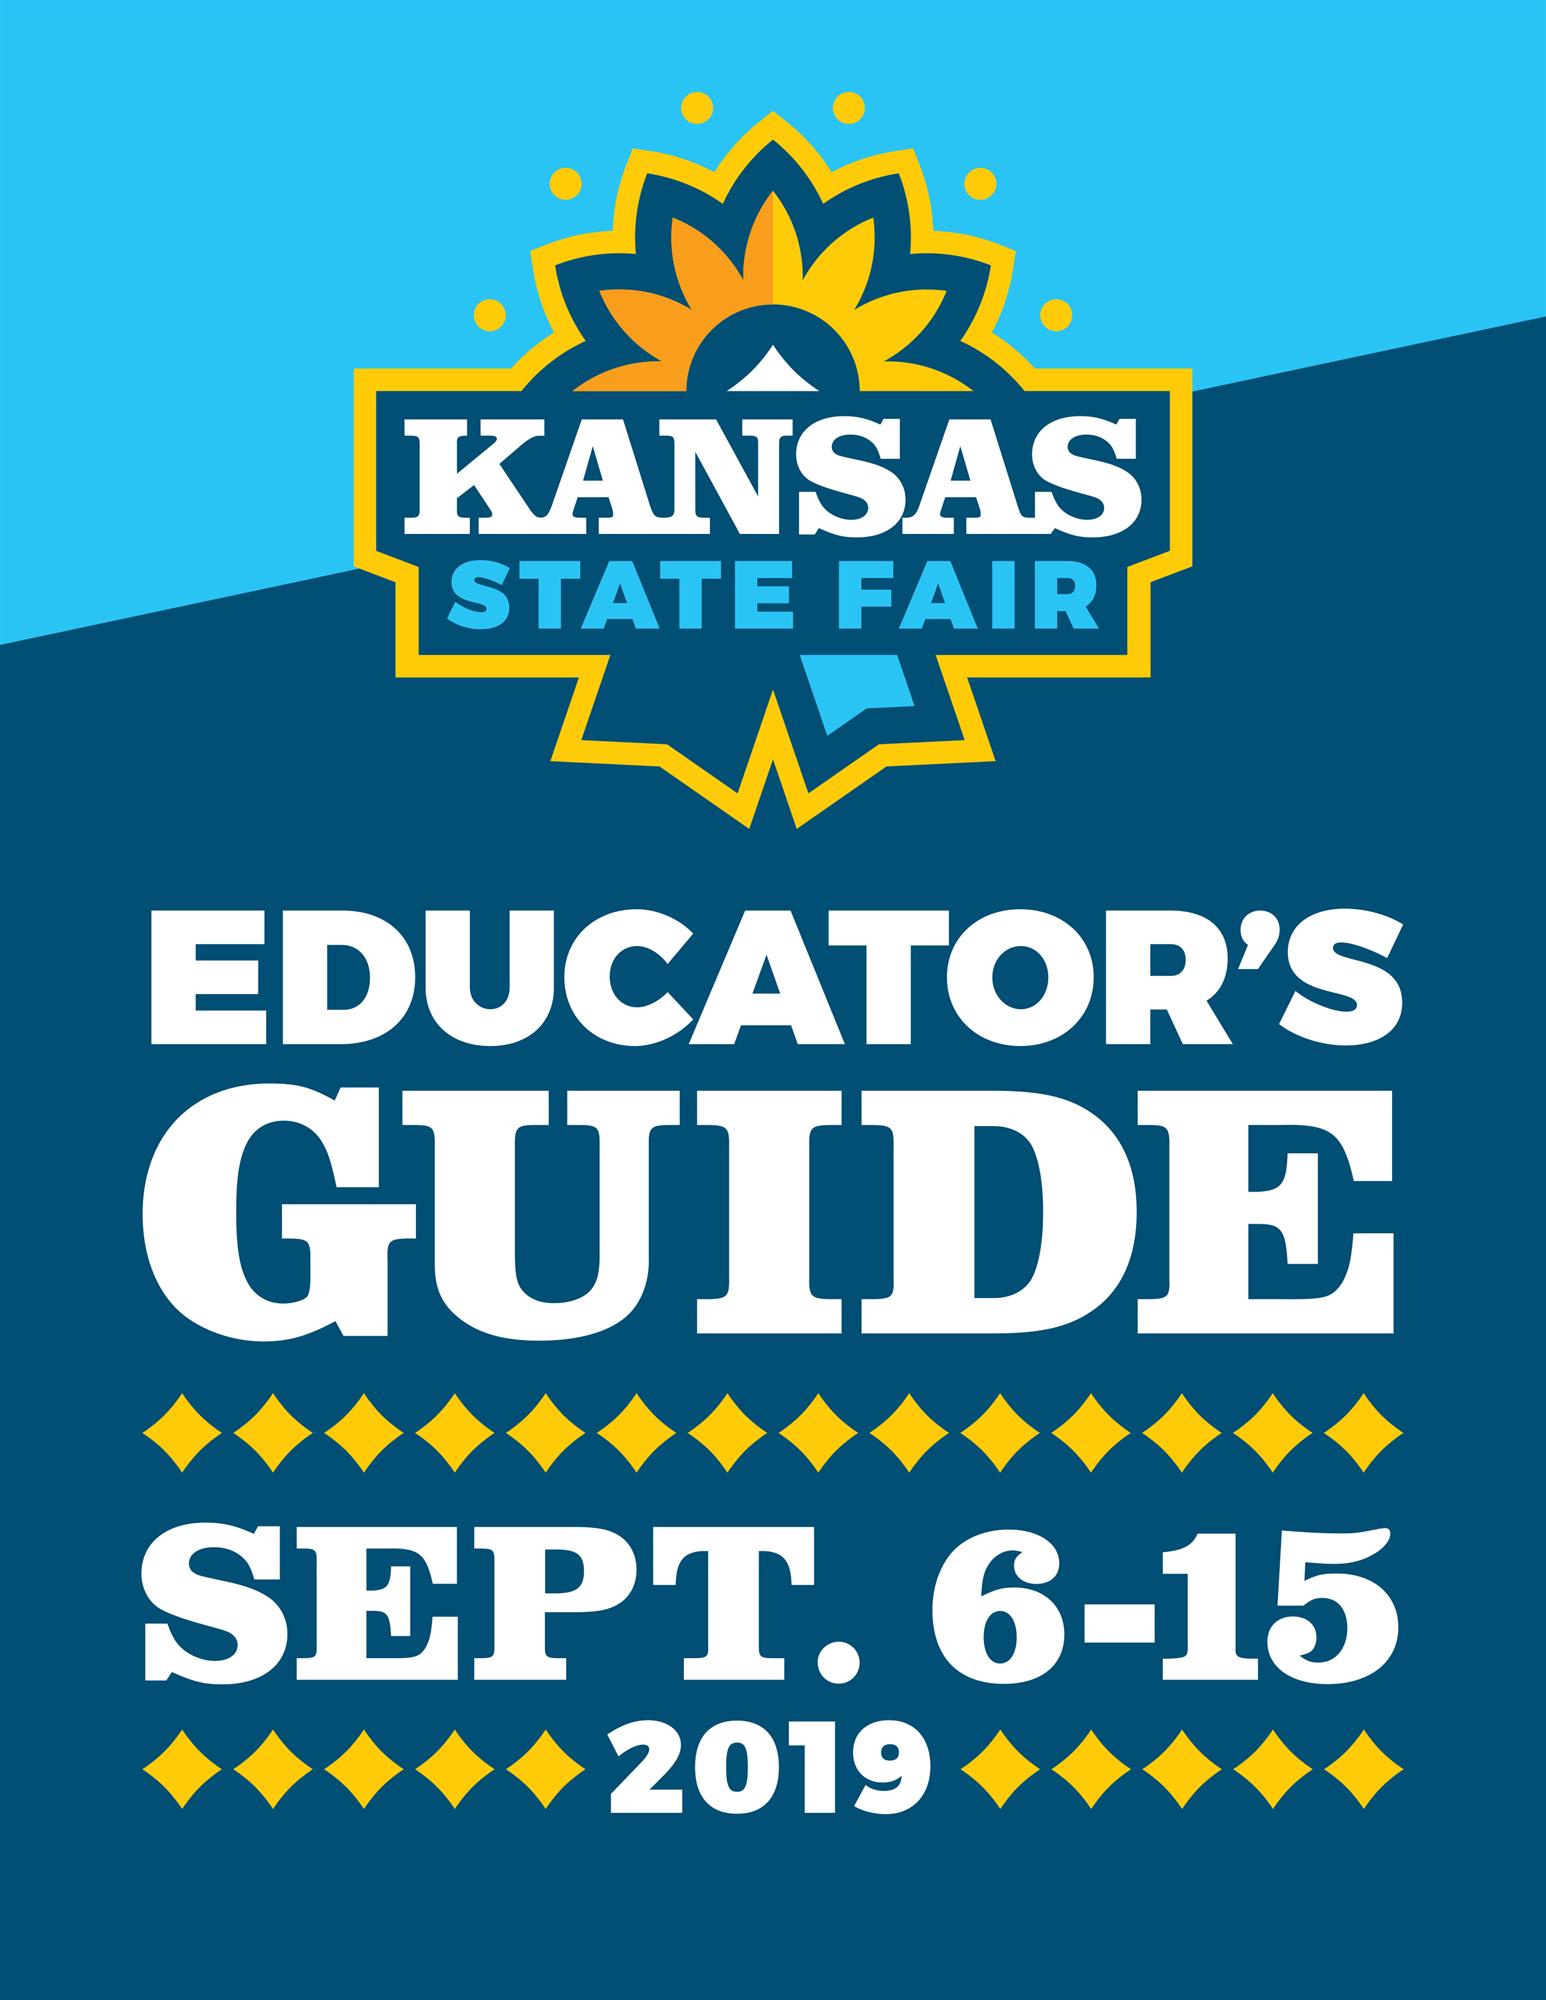 Educator's Guide